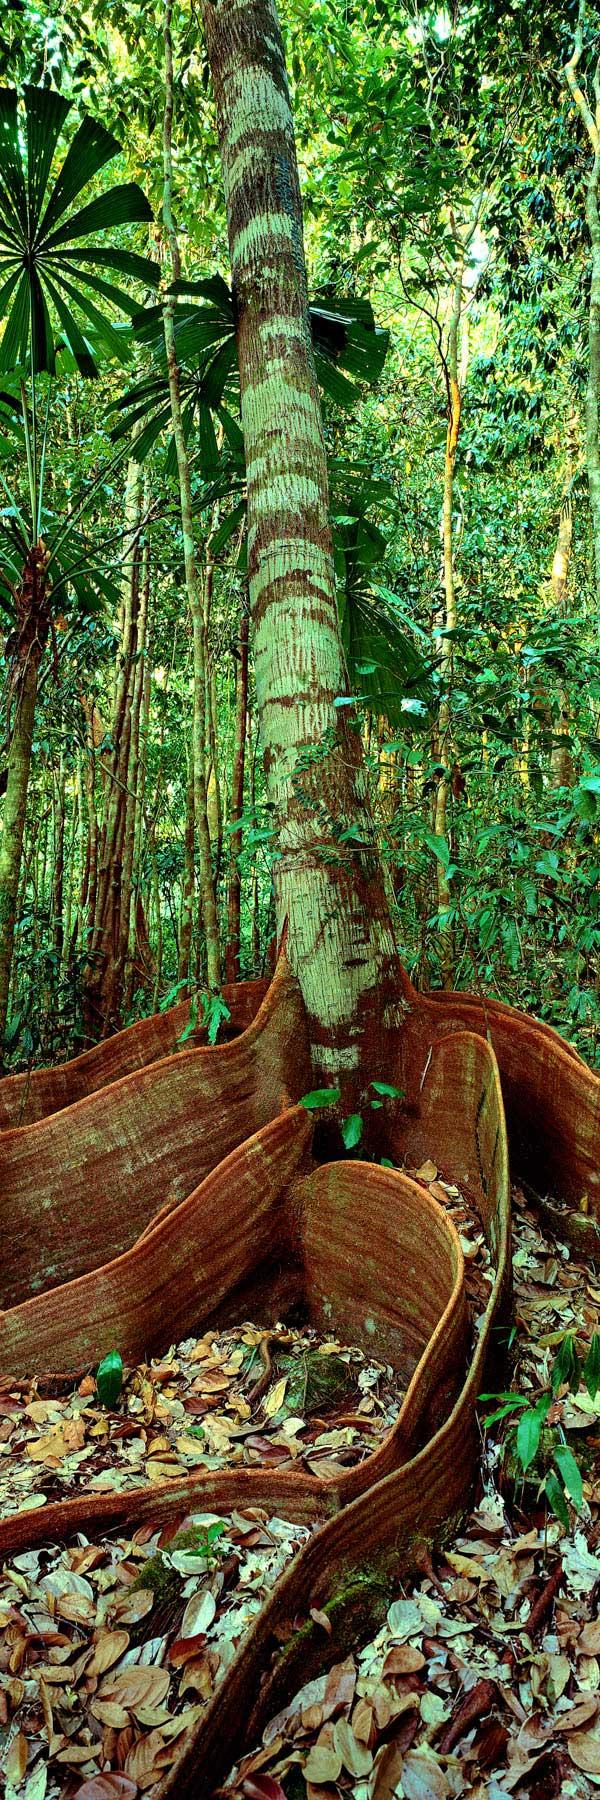 The rainforest at Mossman Gorge, Qld, Australia.